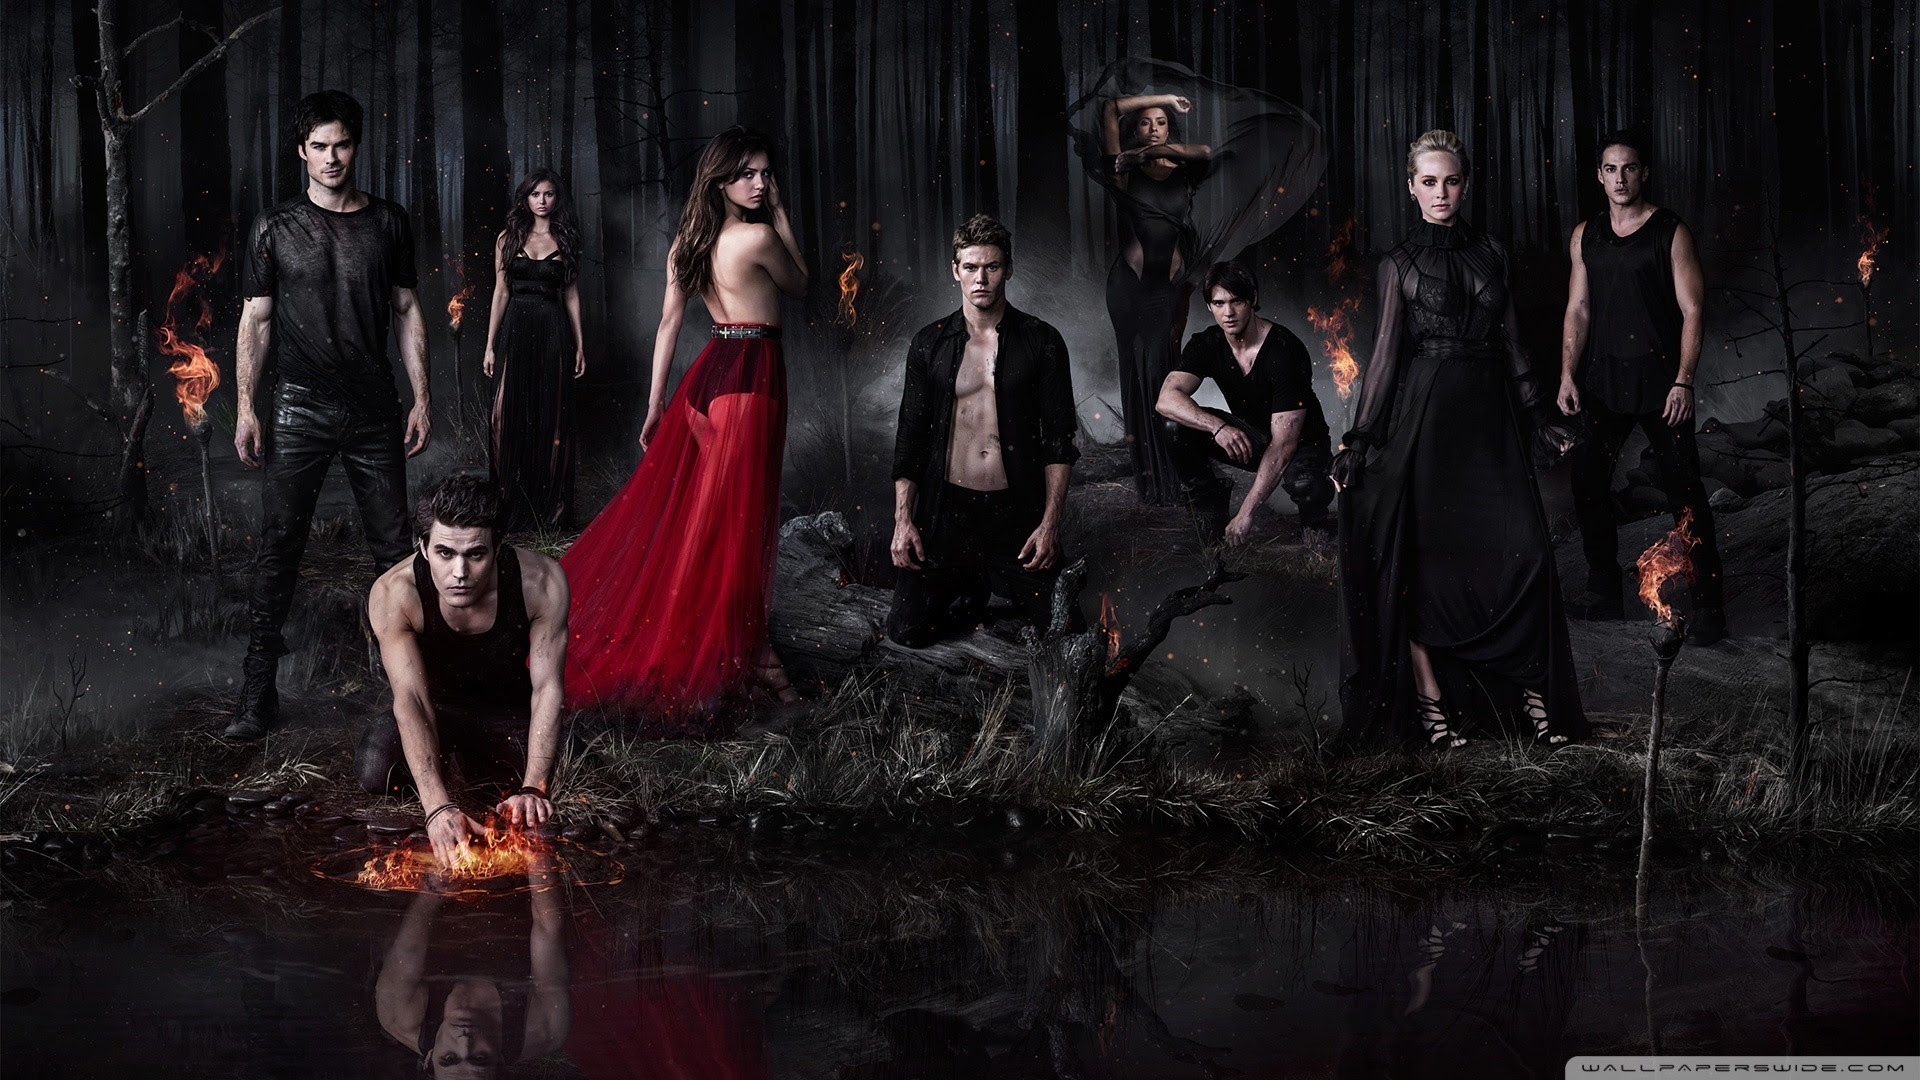 Vampire Diaries Wallpapers 77 Images